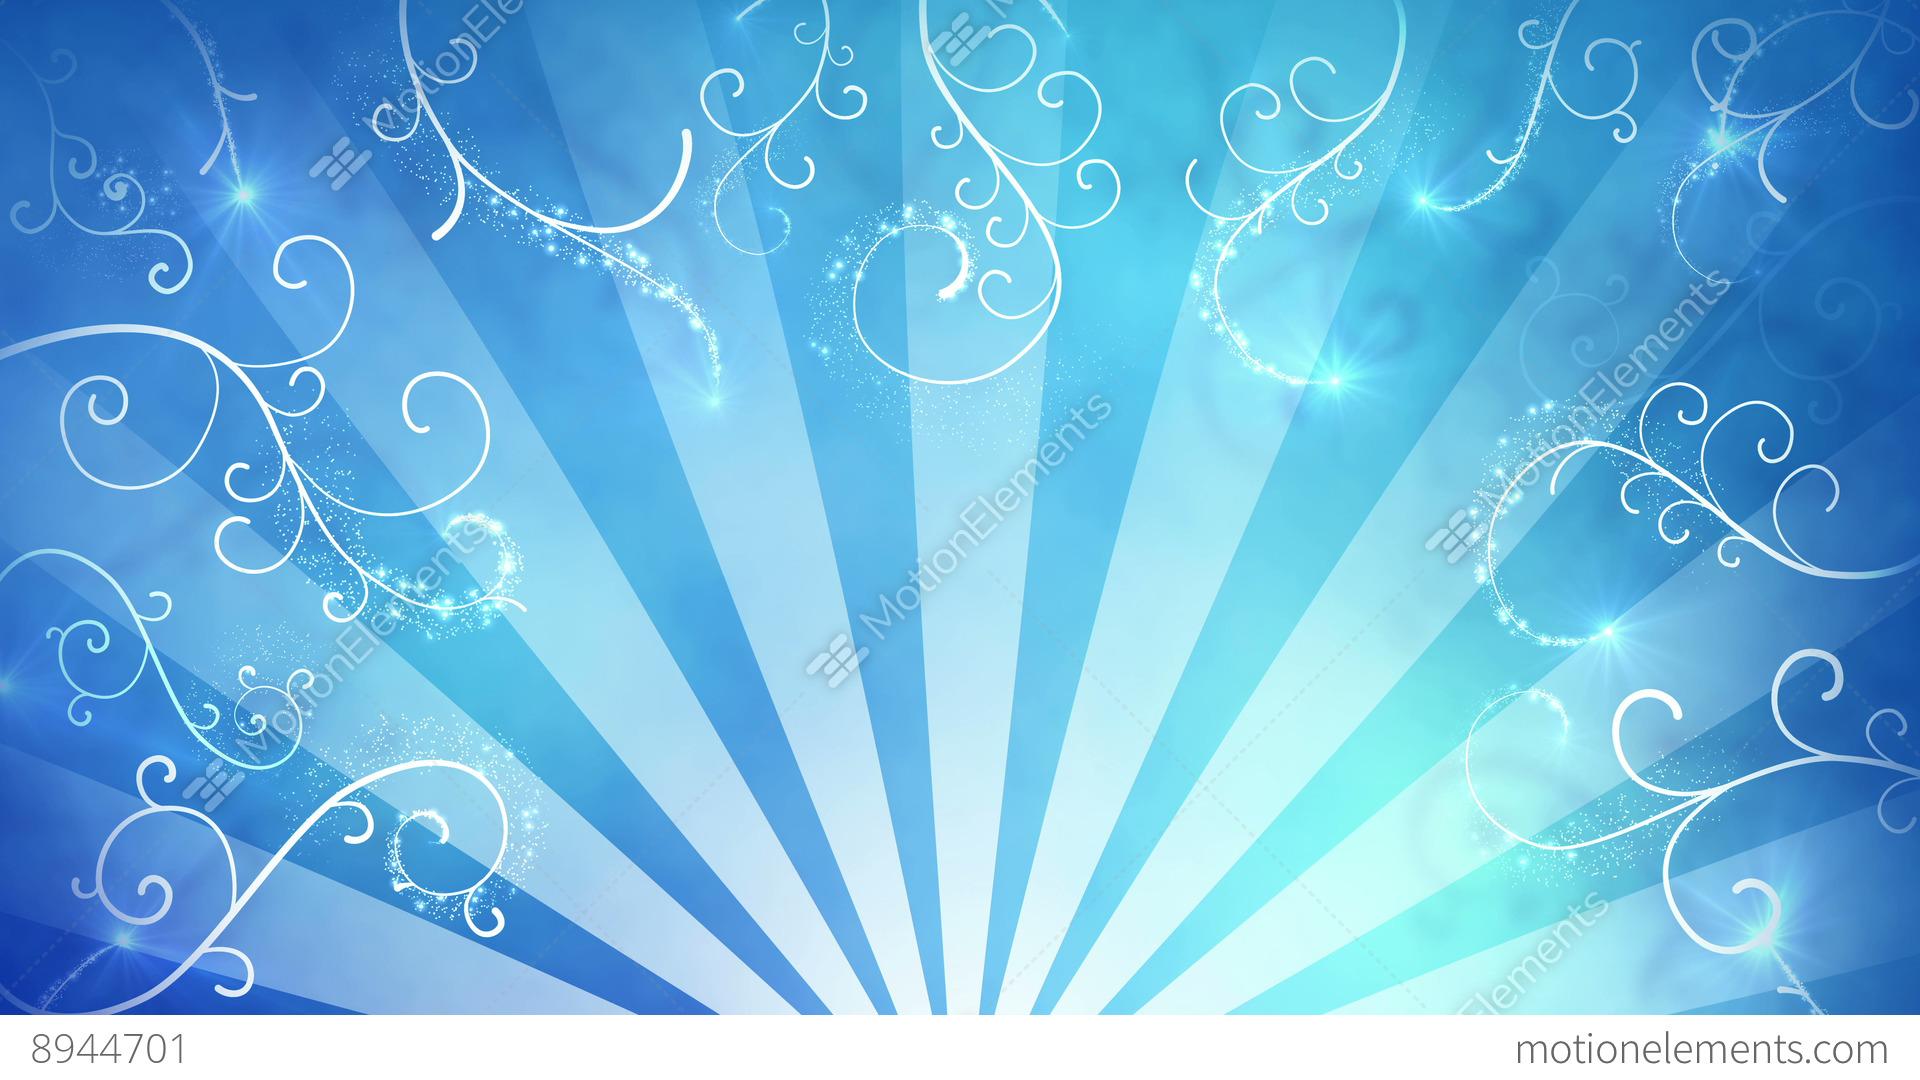 Blue Fancy Background Seamless Loop 4k 4096x2304 Stock Video Footage